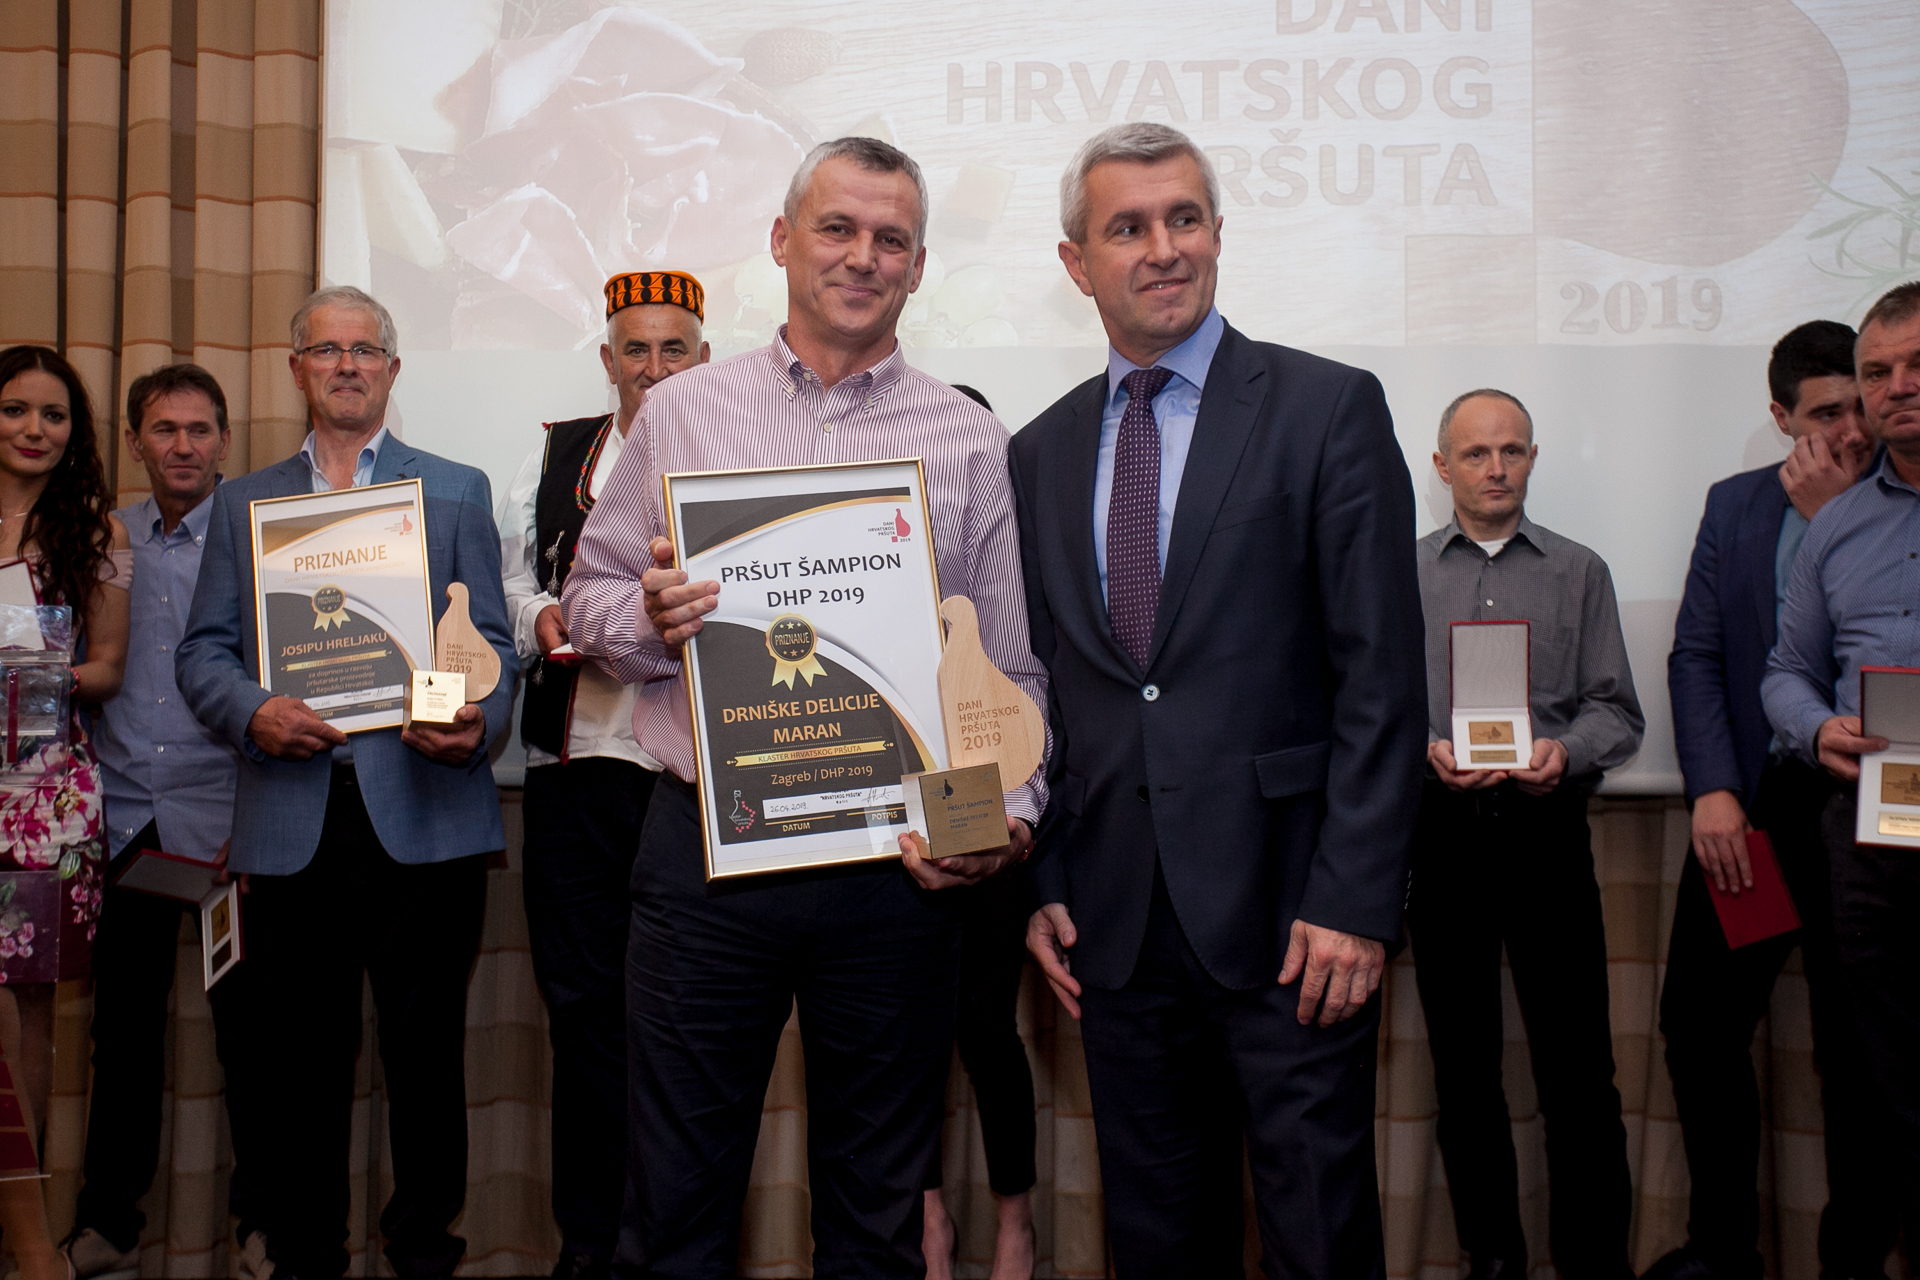 Zoran Ćevid, vlasnik šampionskog pršuta i Tugomir Majdak, državni tajnik u MInistarstvu poljoprivrede